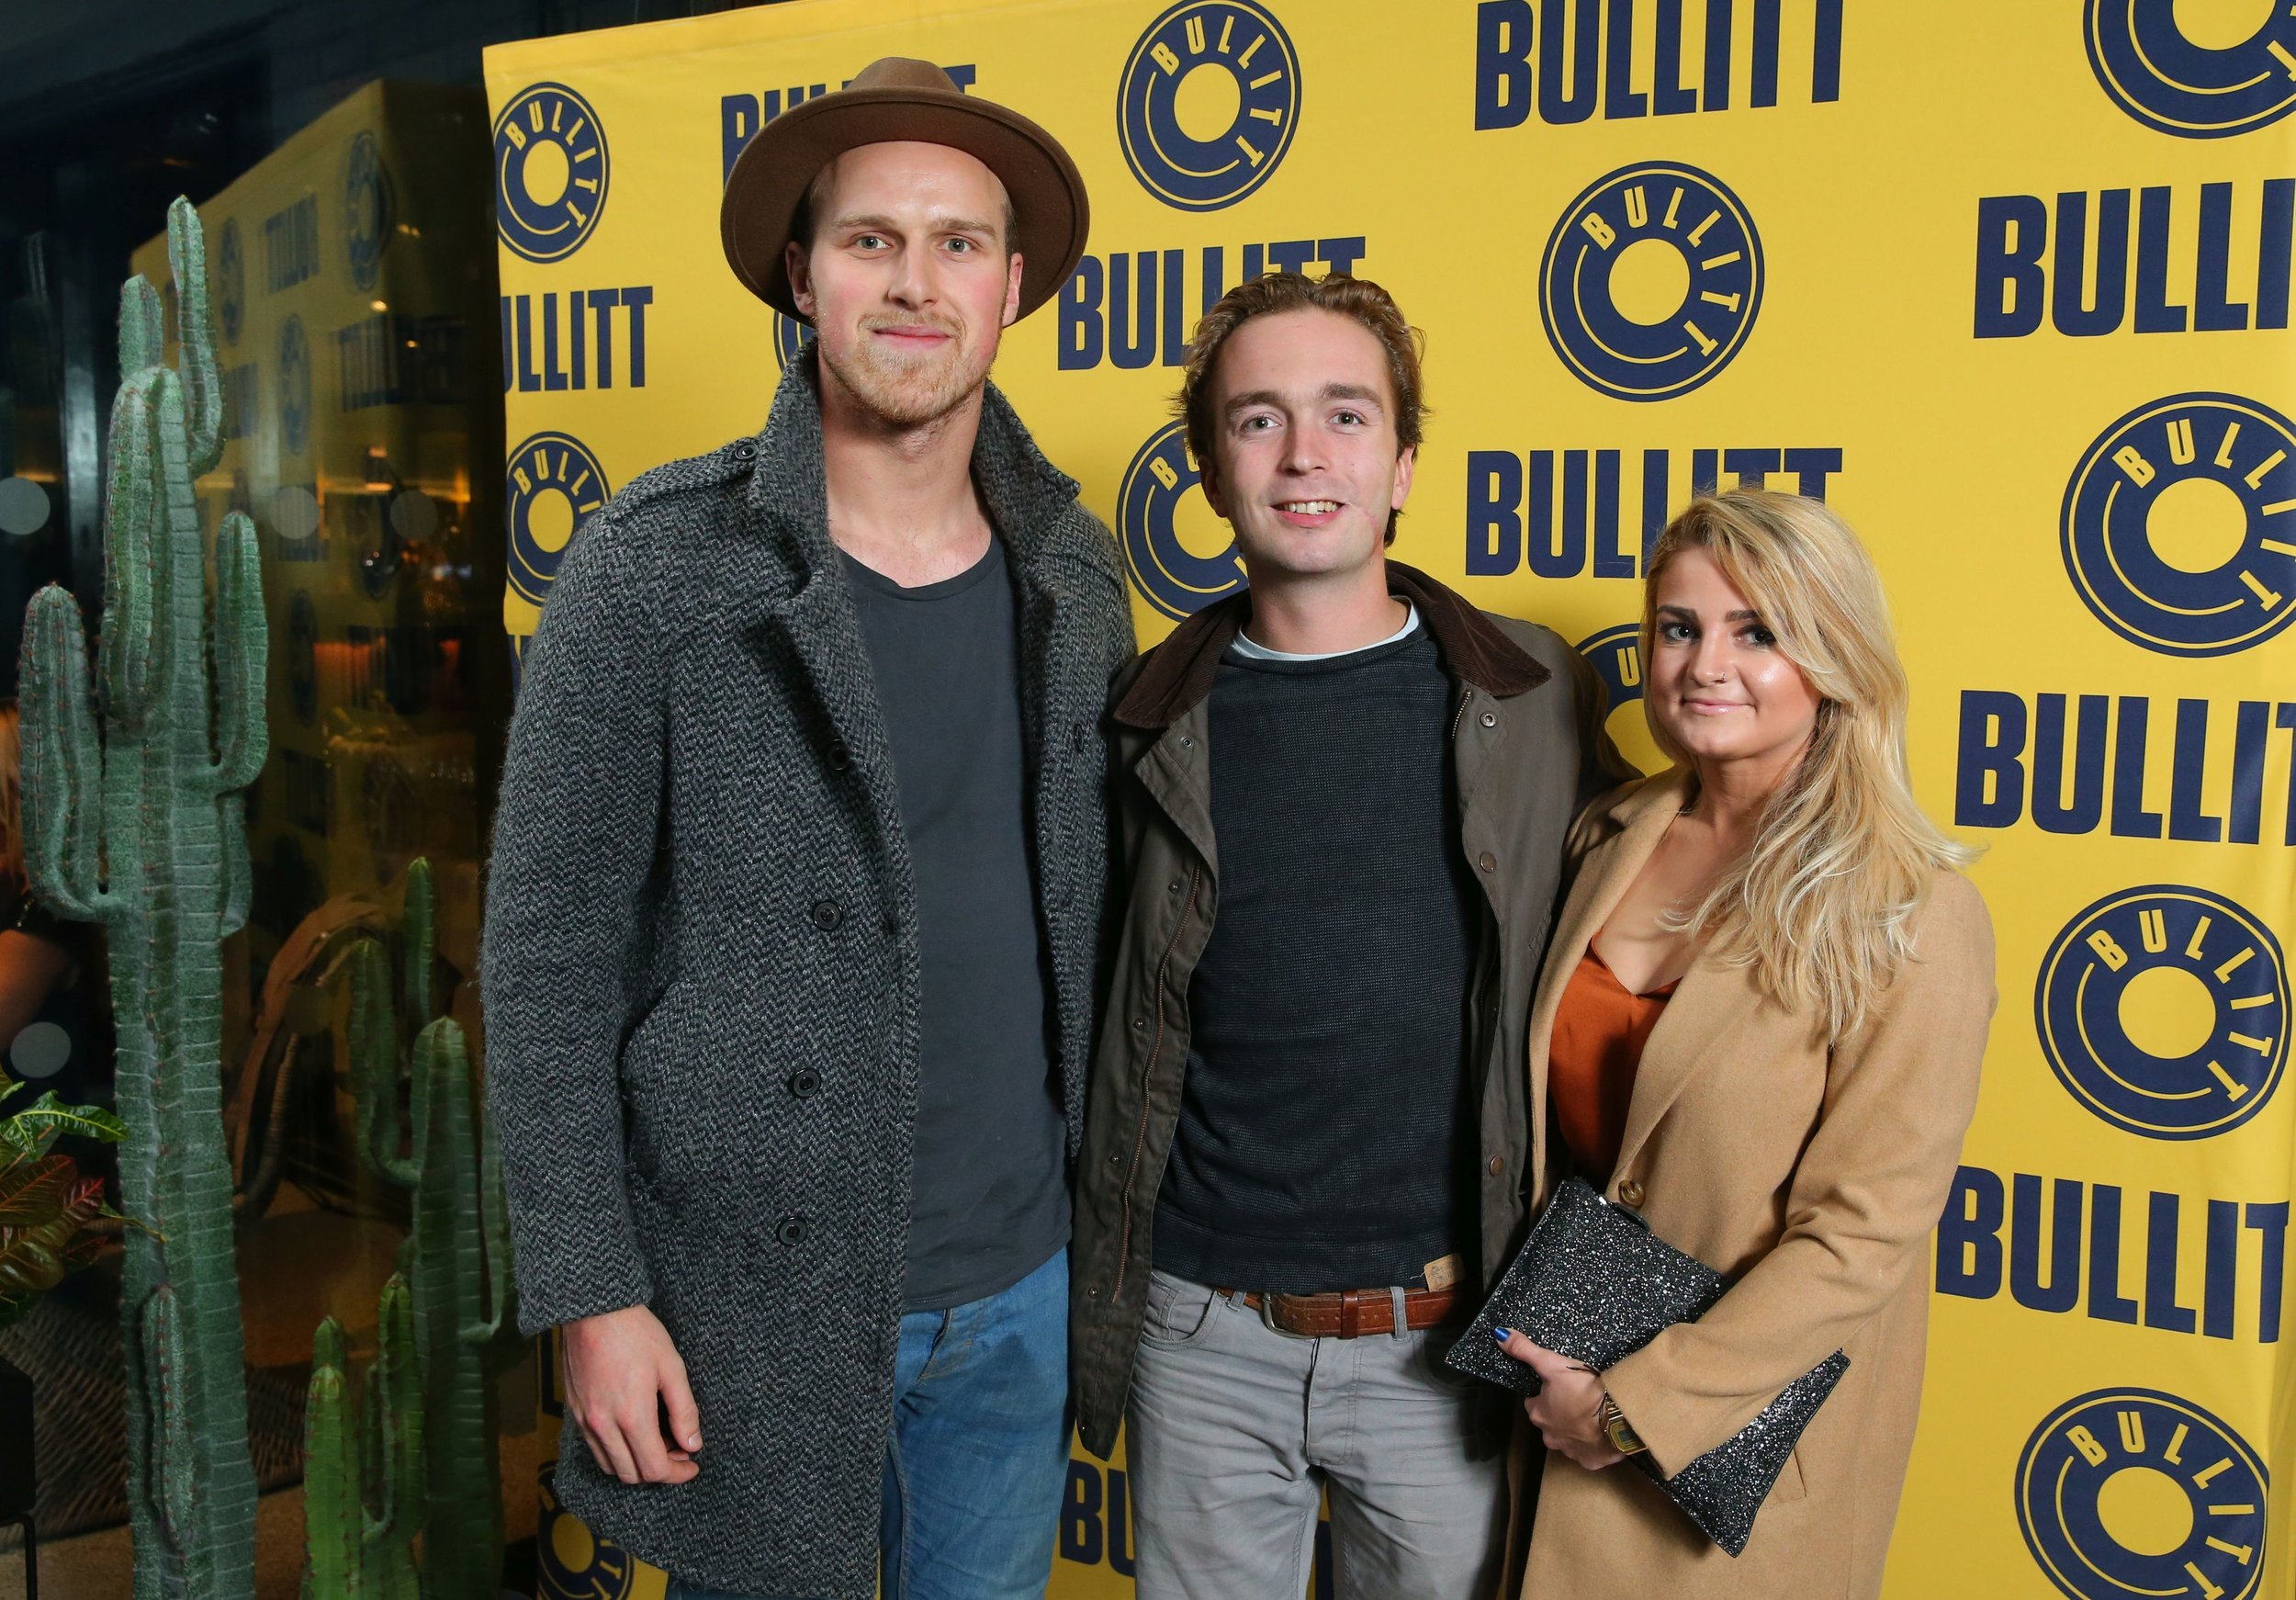 Bullitt Launch Socials 27.JPG